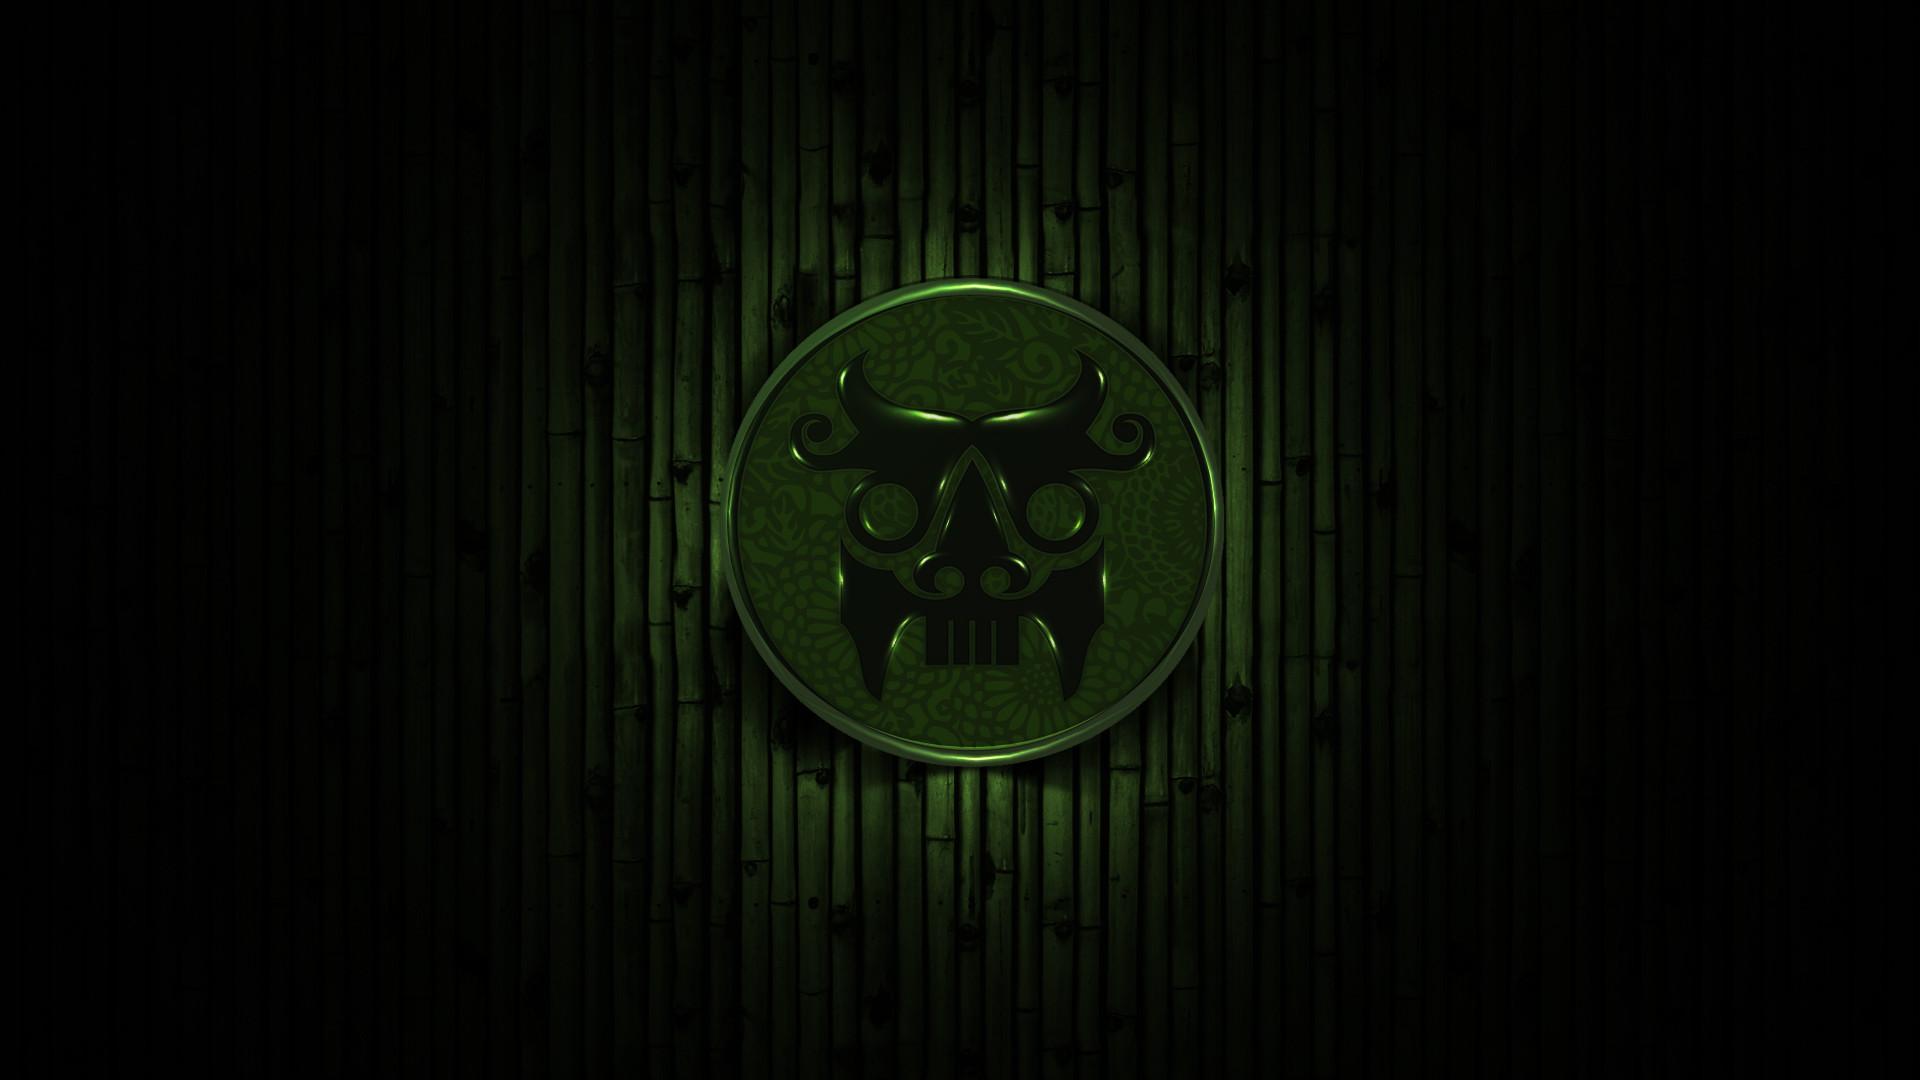 Pink Floyd Iphone X Wallpaper Illuminati Wallpaper 1080p 73 Images